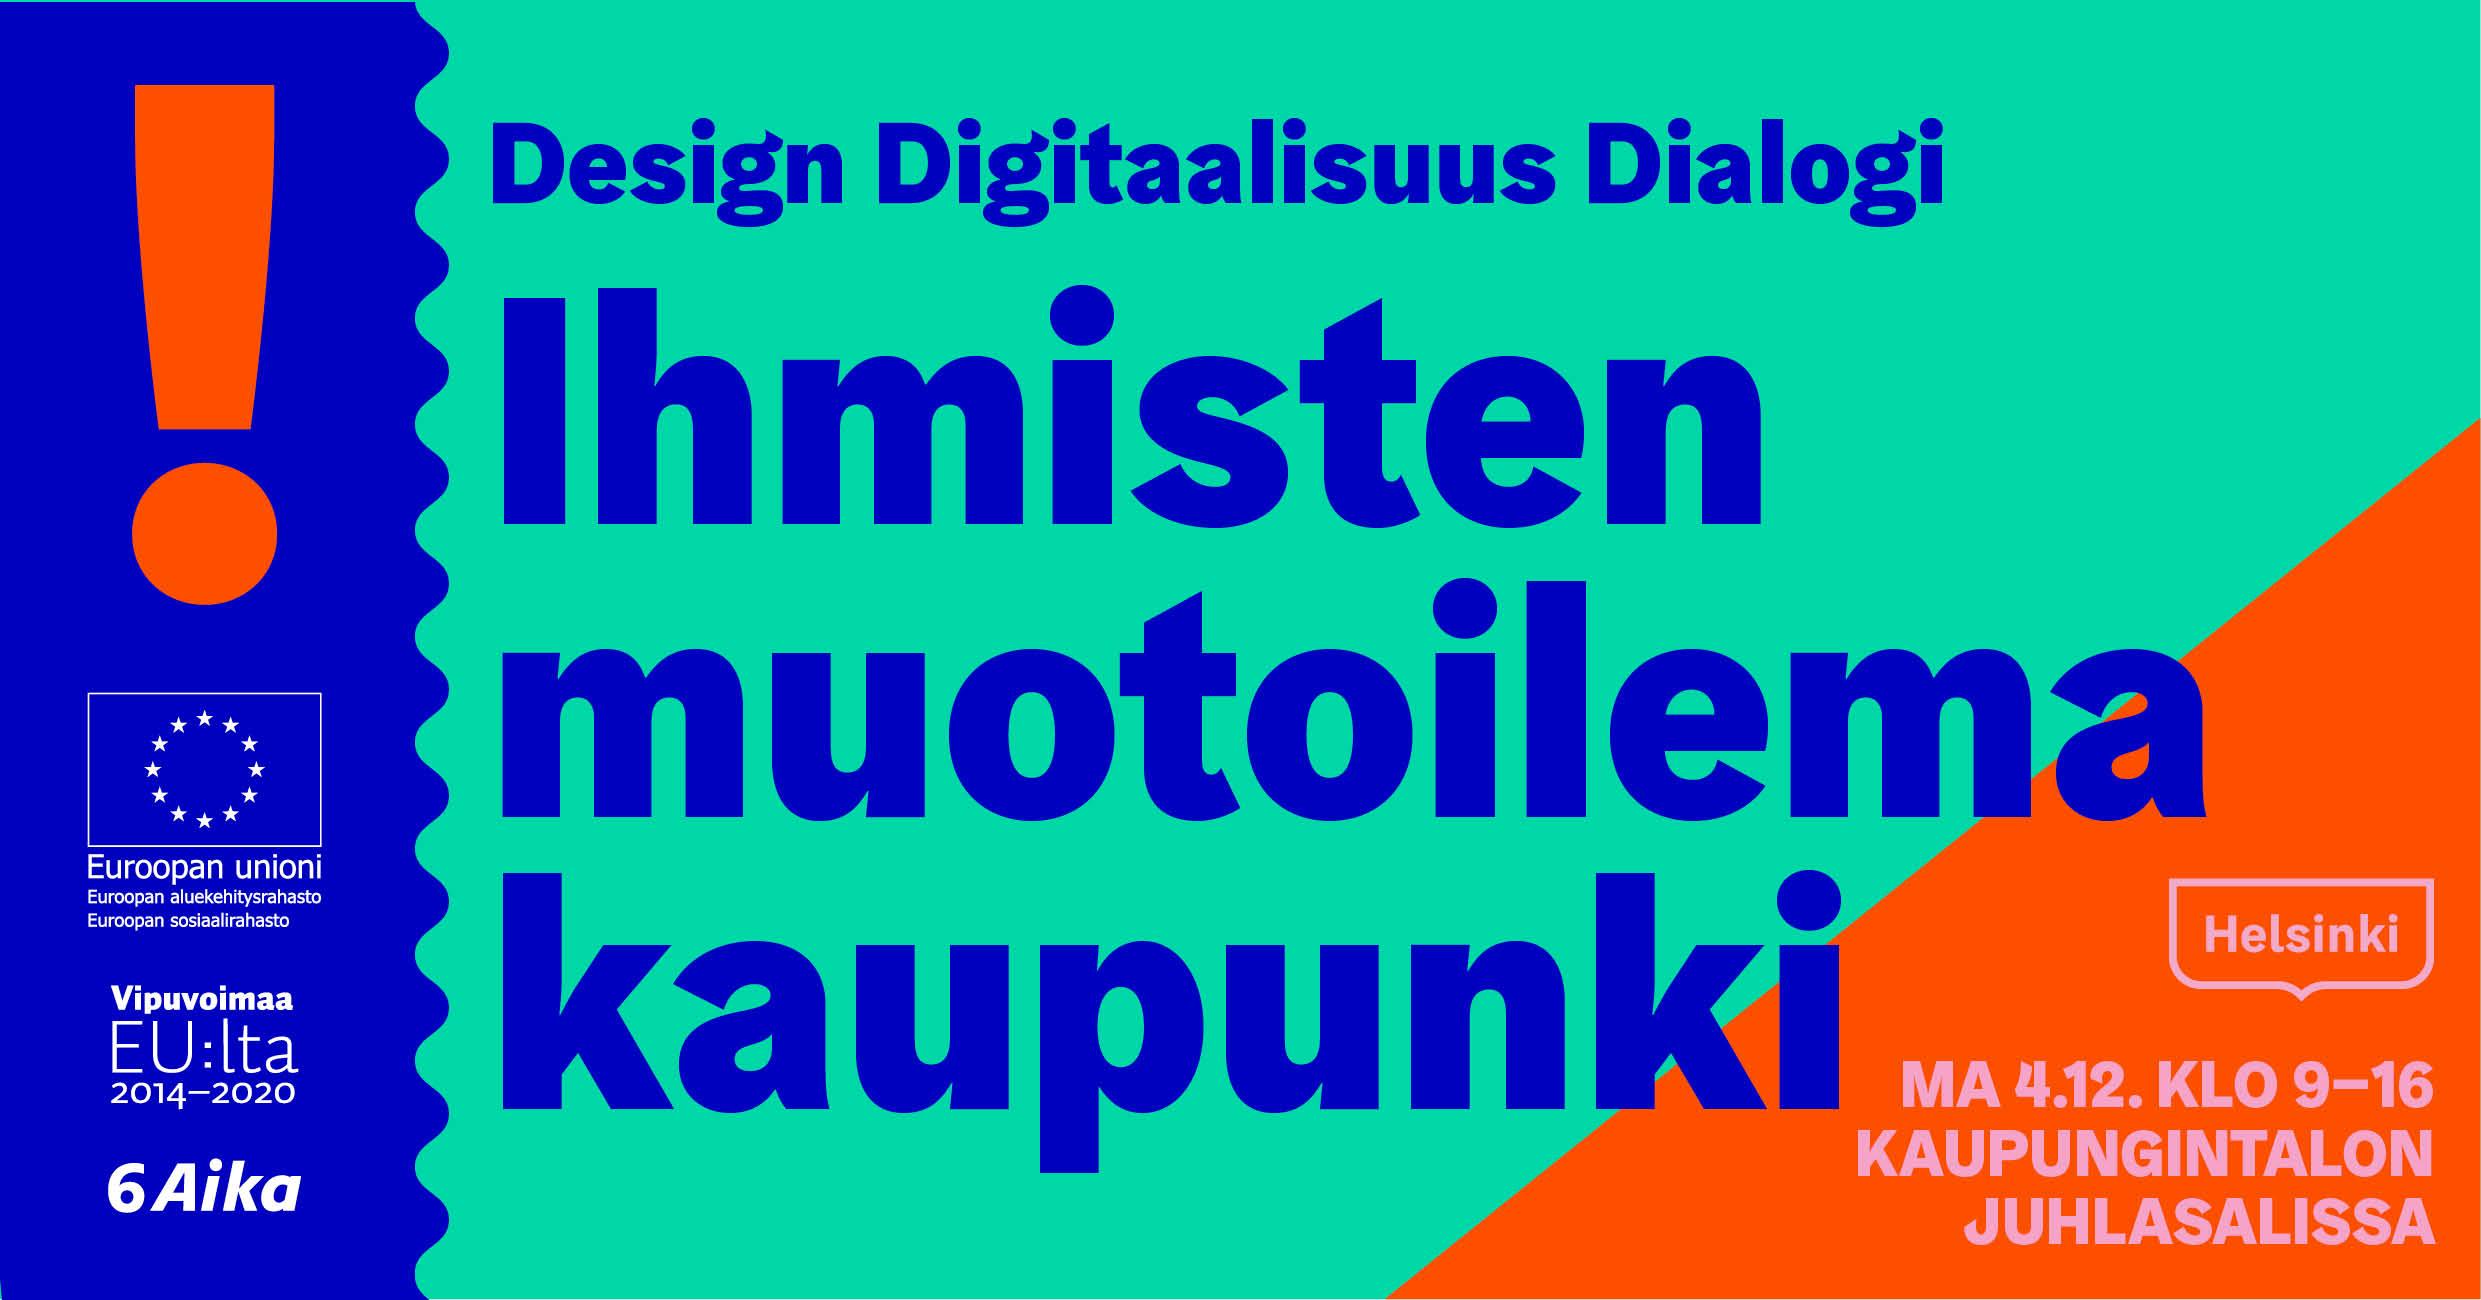 Cover for article 'Ihmisten muotoilema kaupunki 4.12.'